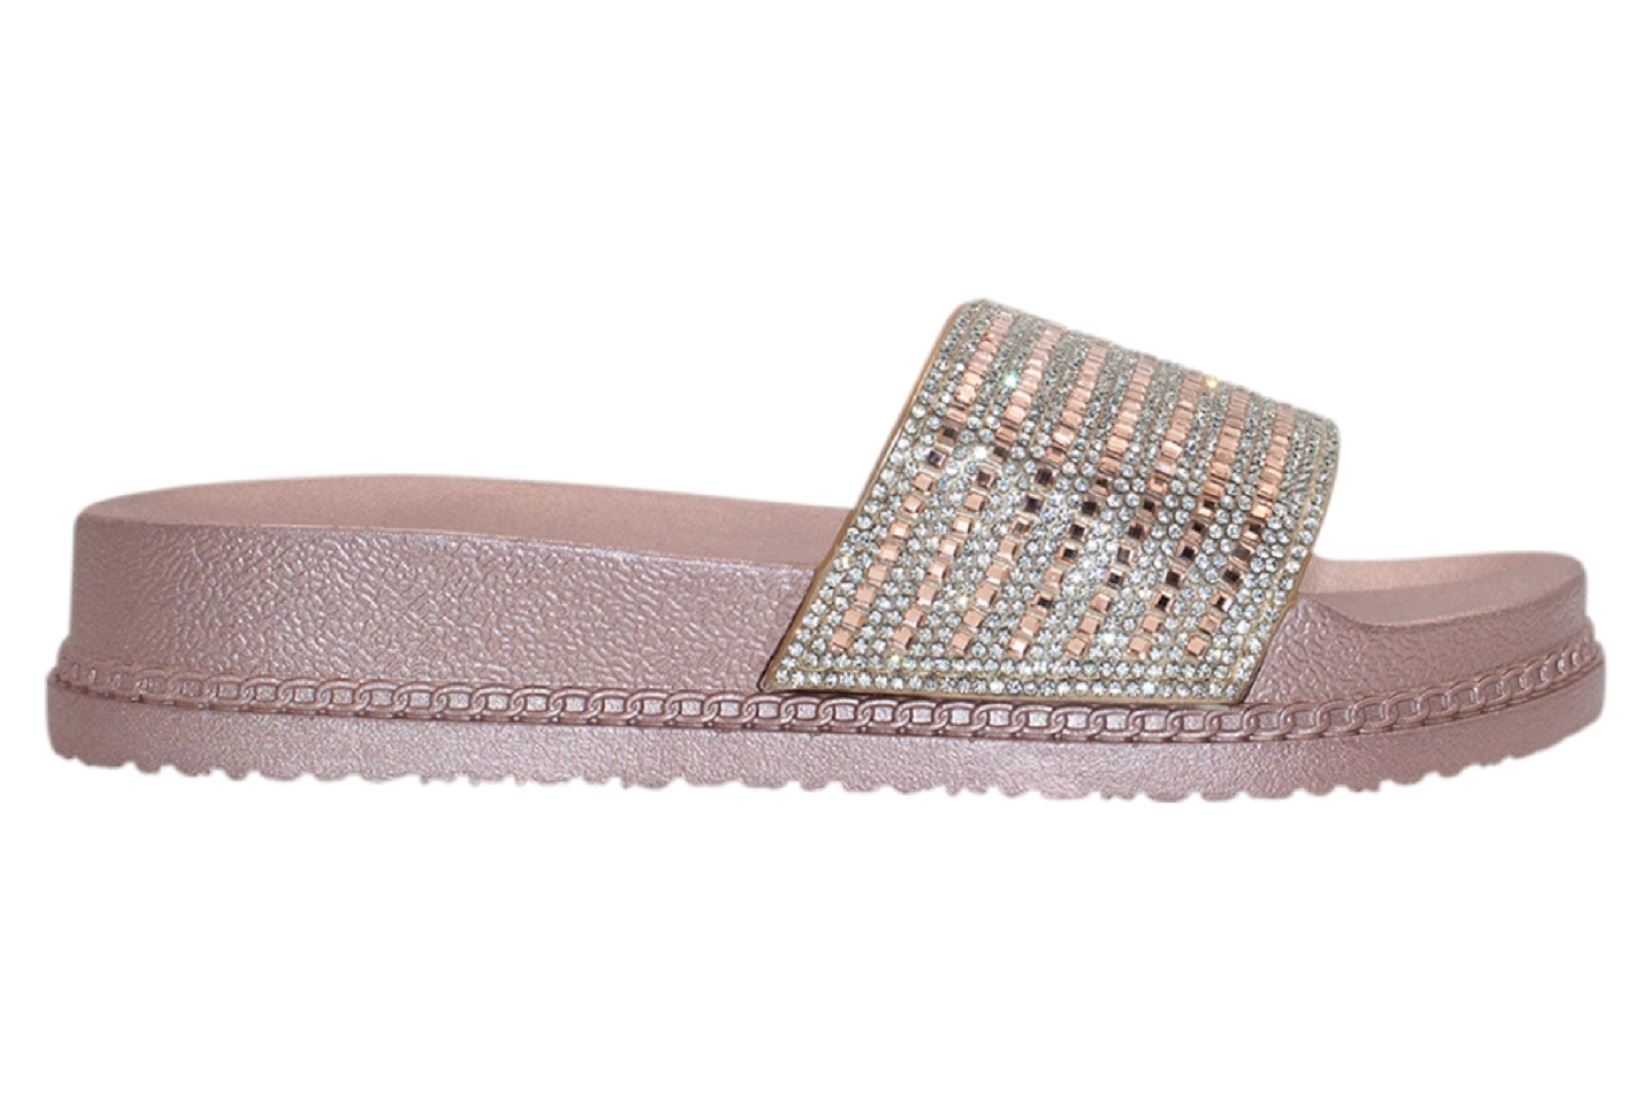 Womens-Sliders-Casual-Slippers-Mules-Ladies-Diamante-Flip-Flop-Sandals-Shoes thumbnail 31